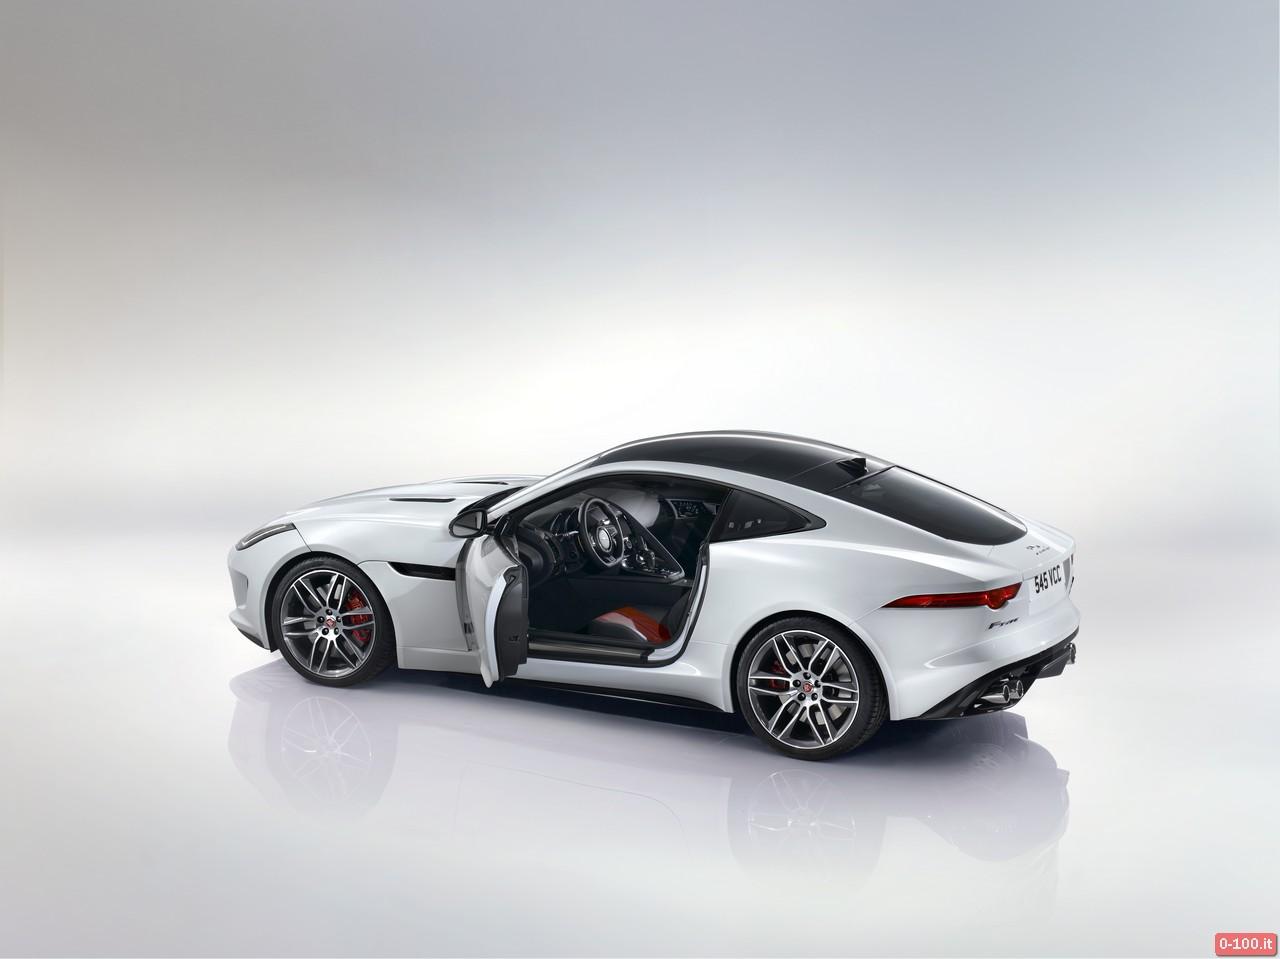 jaguar-f-type-r-coupe_price-prezzo-0-100_6